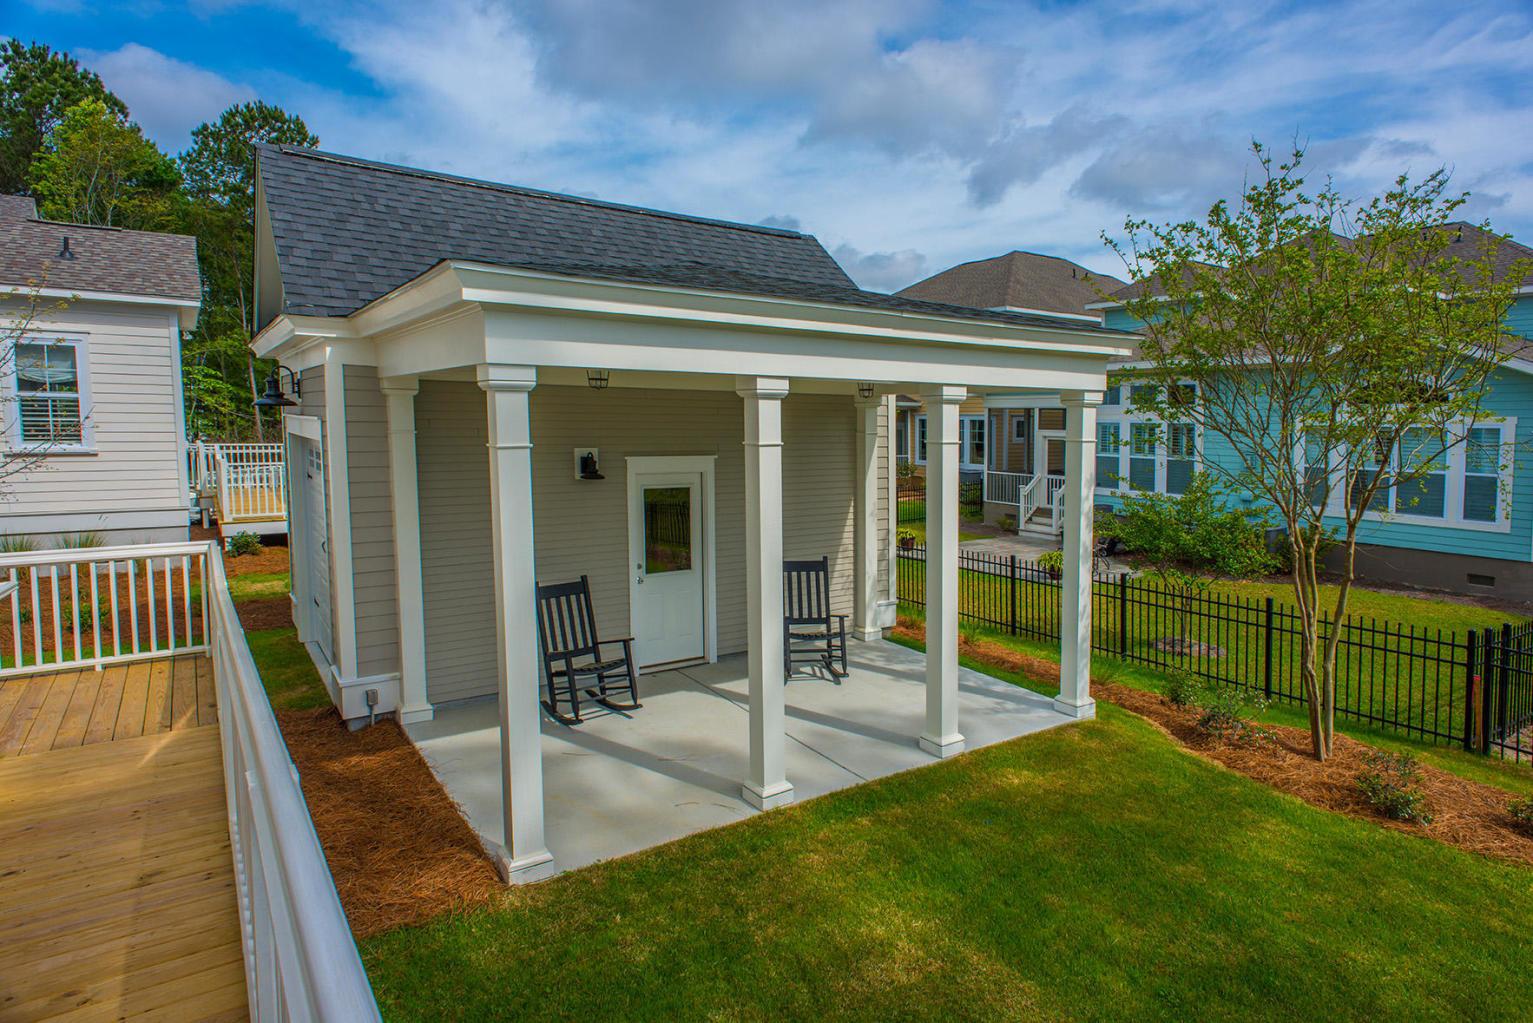 Carolina Park Homes For Sale - 1534 Banning, Mount Pleasant, SC - 3